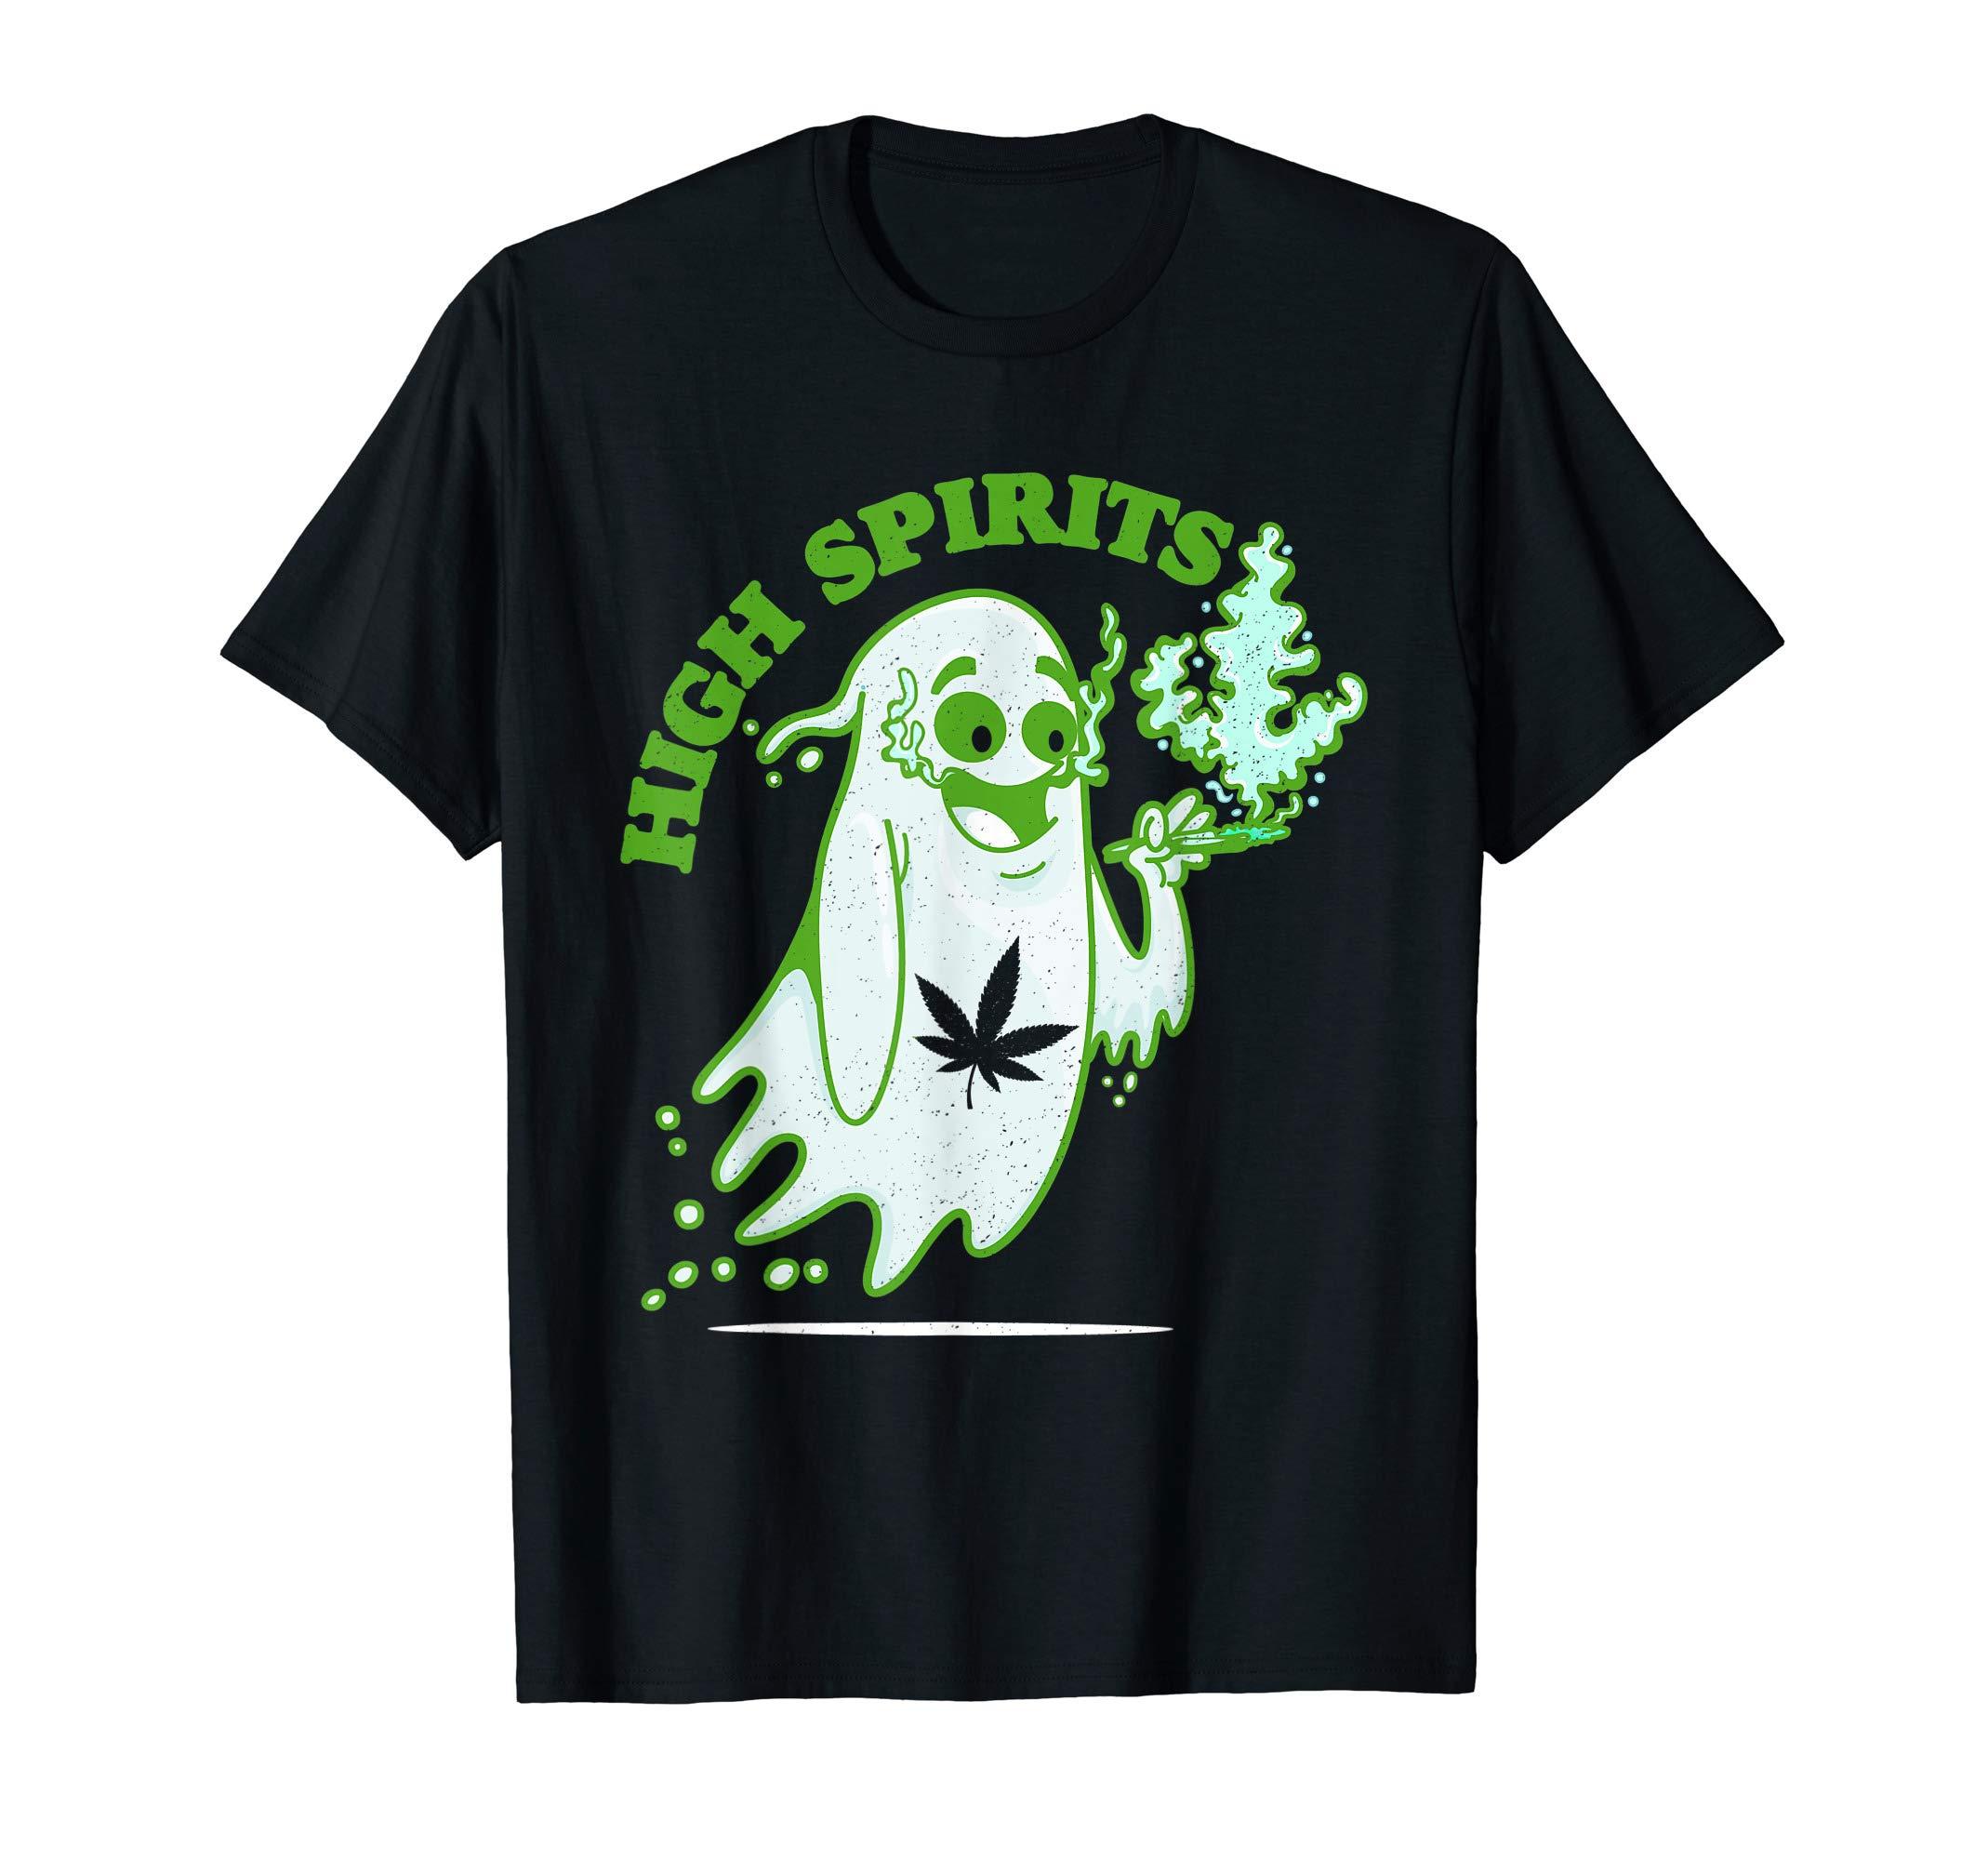 Funny Halloween Marijuana CBD Weed Smokers Stoners & Pothead T-Shirt